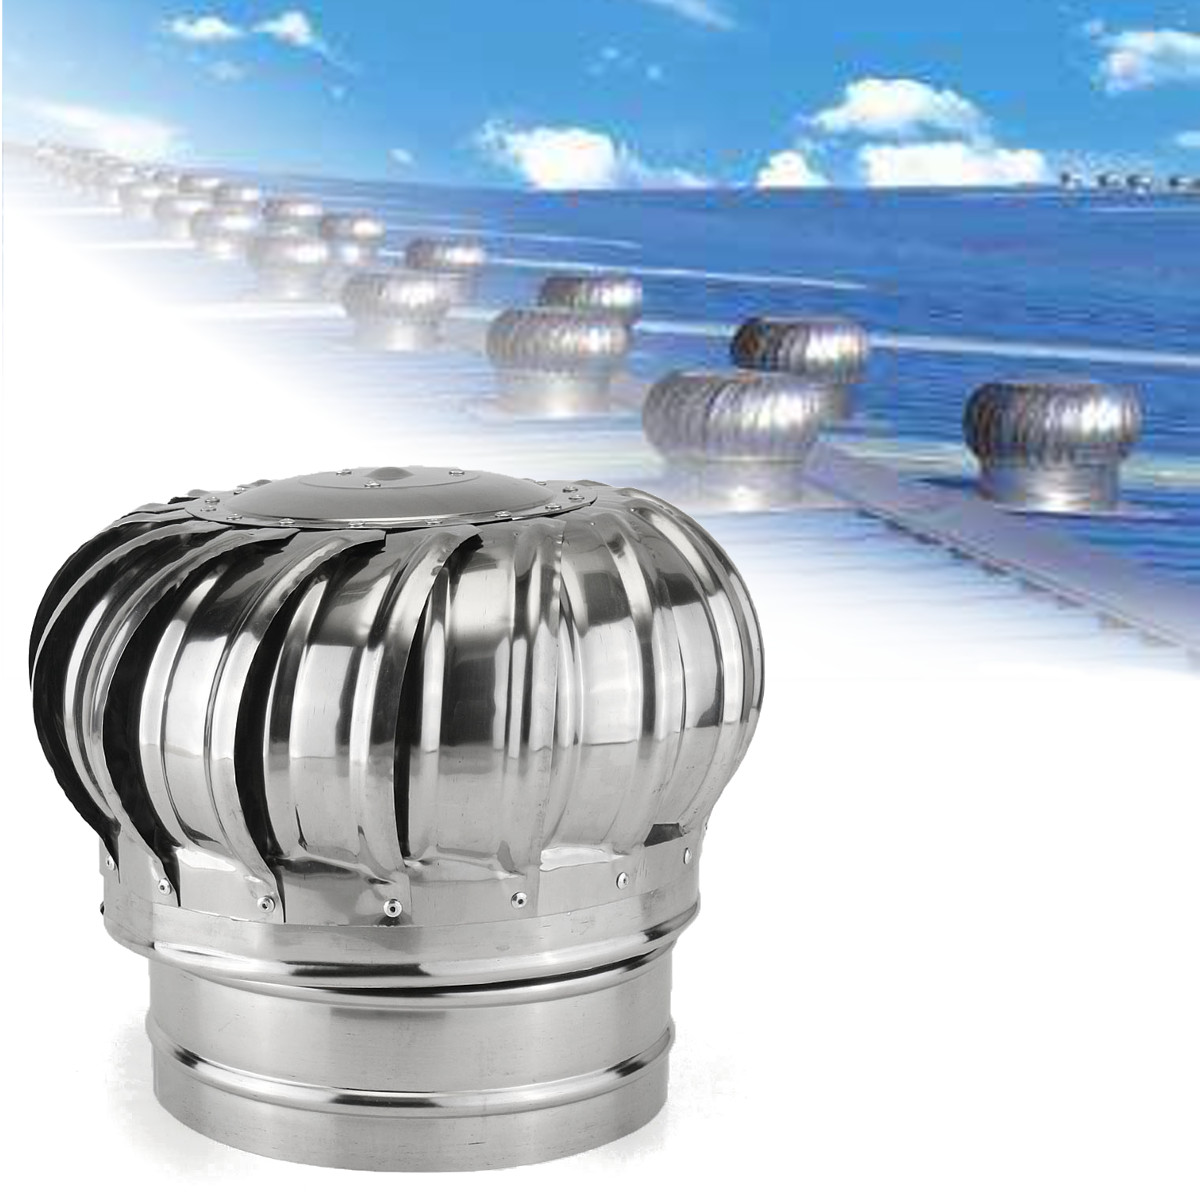 150mm 200mm Stainless Steel Roof Ventilator Wind Turbines Air Vent Attic Ventilator